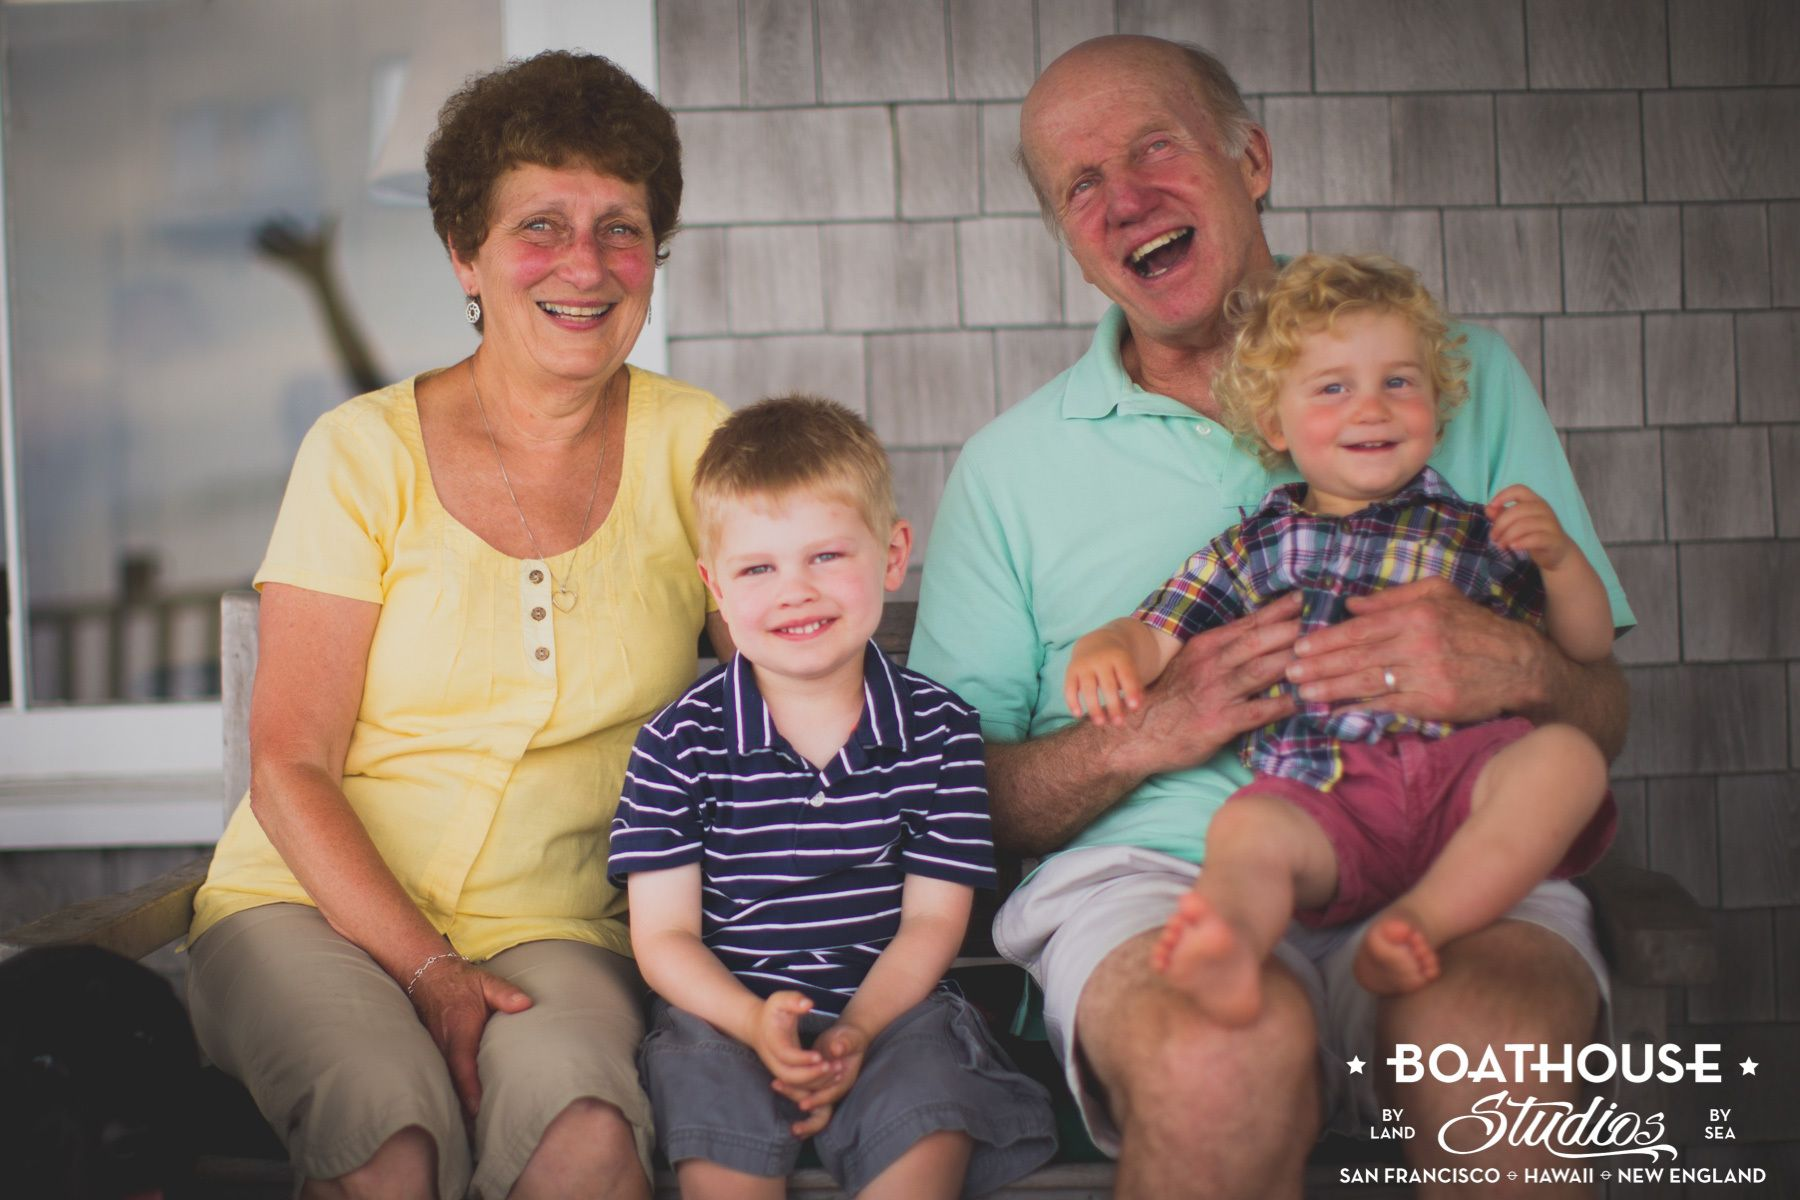 Three Generations, One Summer Day